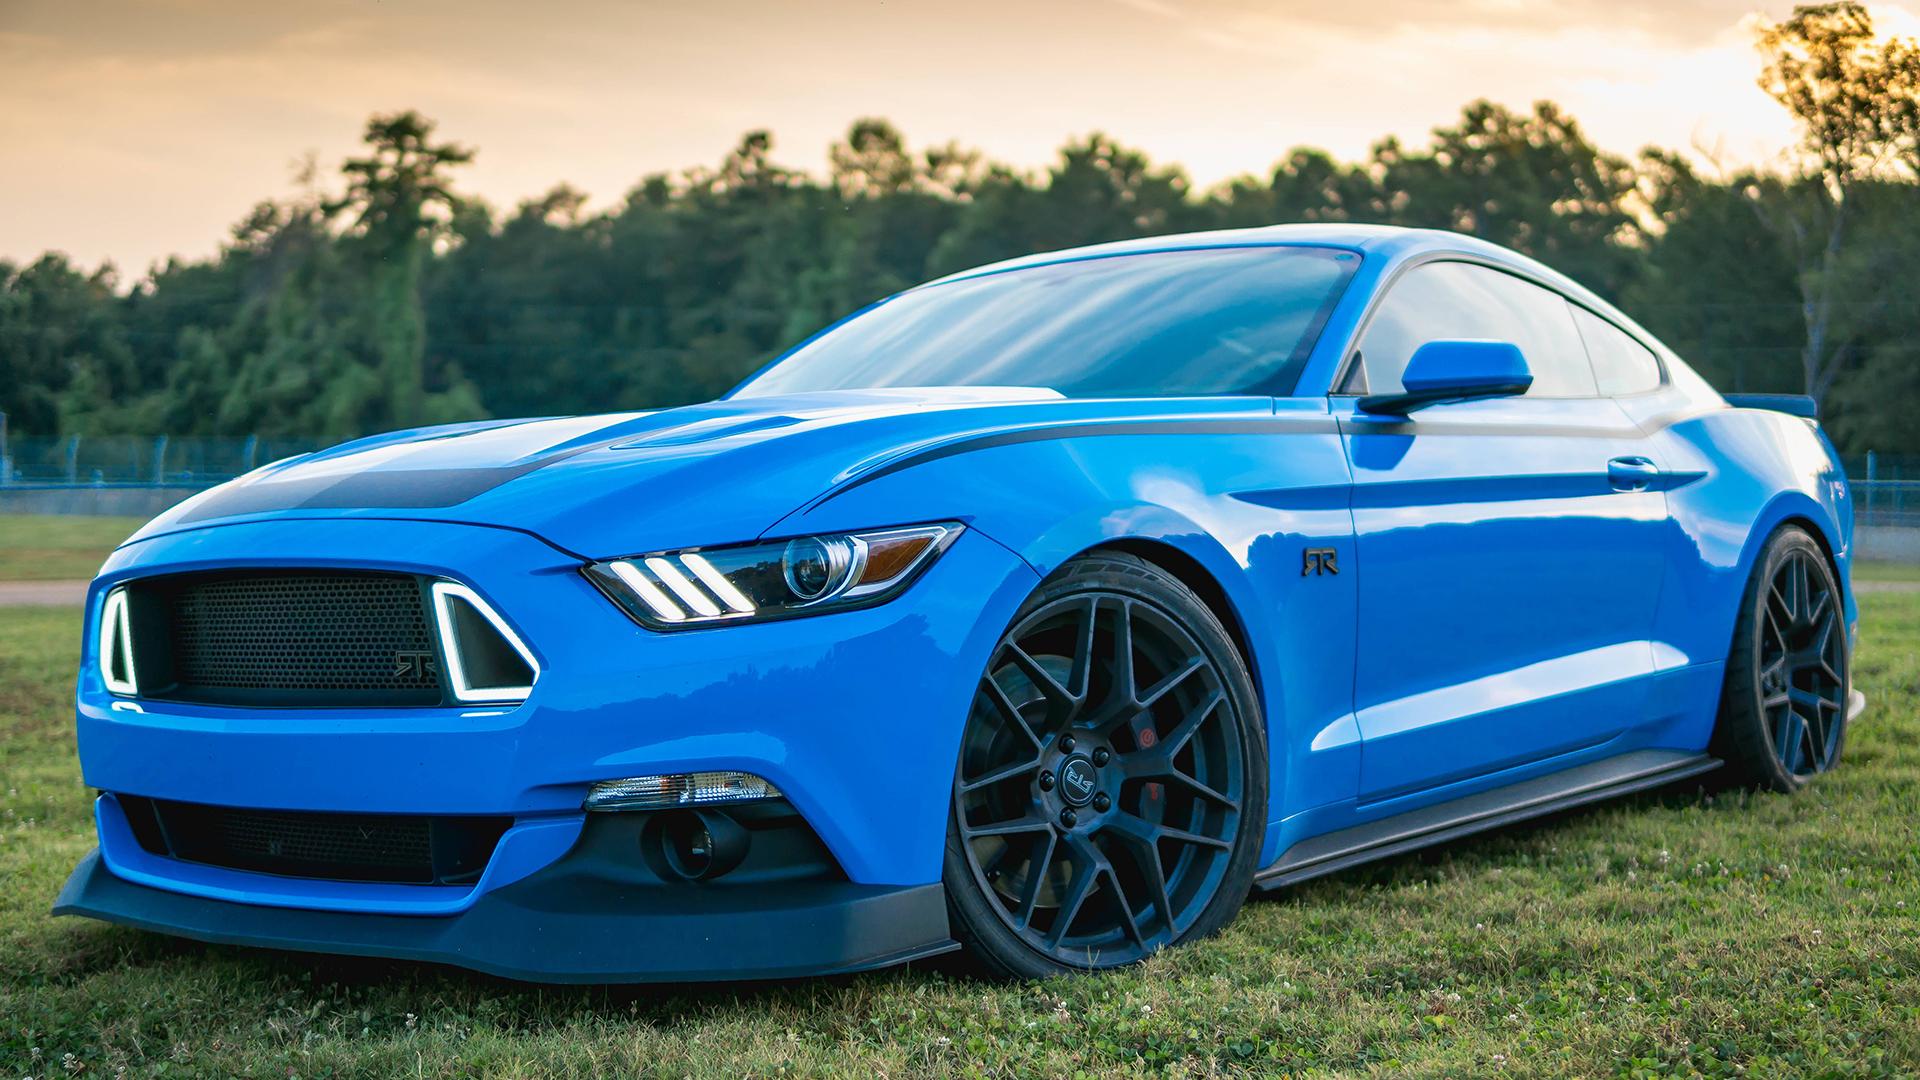 2015 Mustang Rtr >> Wallpaper Ford Mustang 2015 Ford Mustang Rtr Car